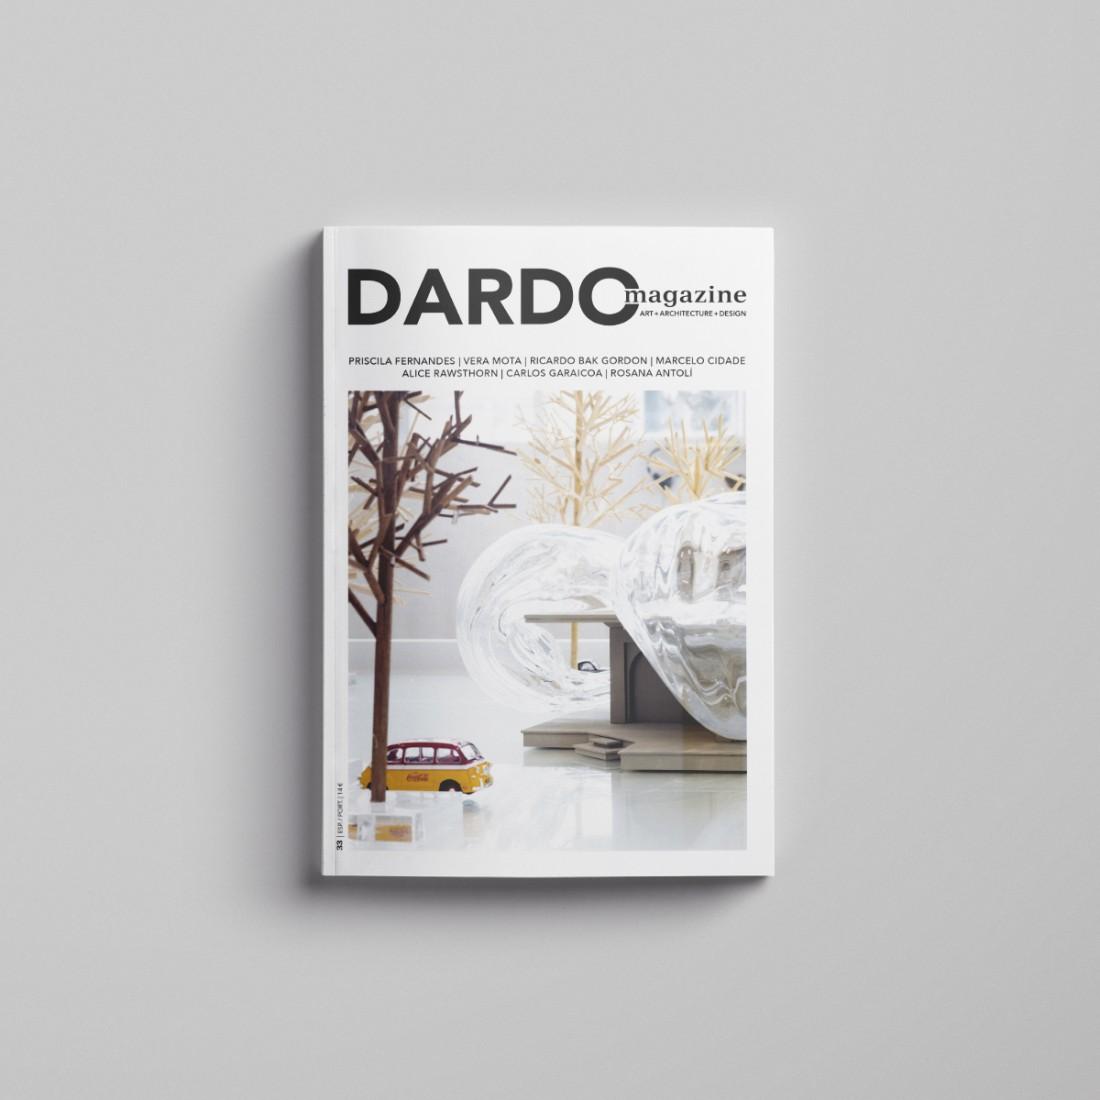 DARDOmagazine 33